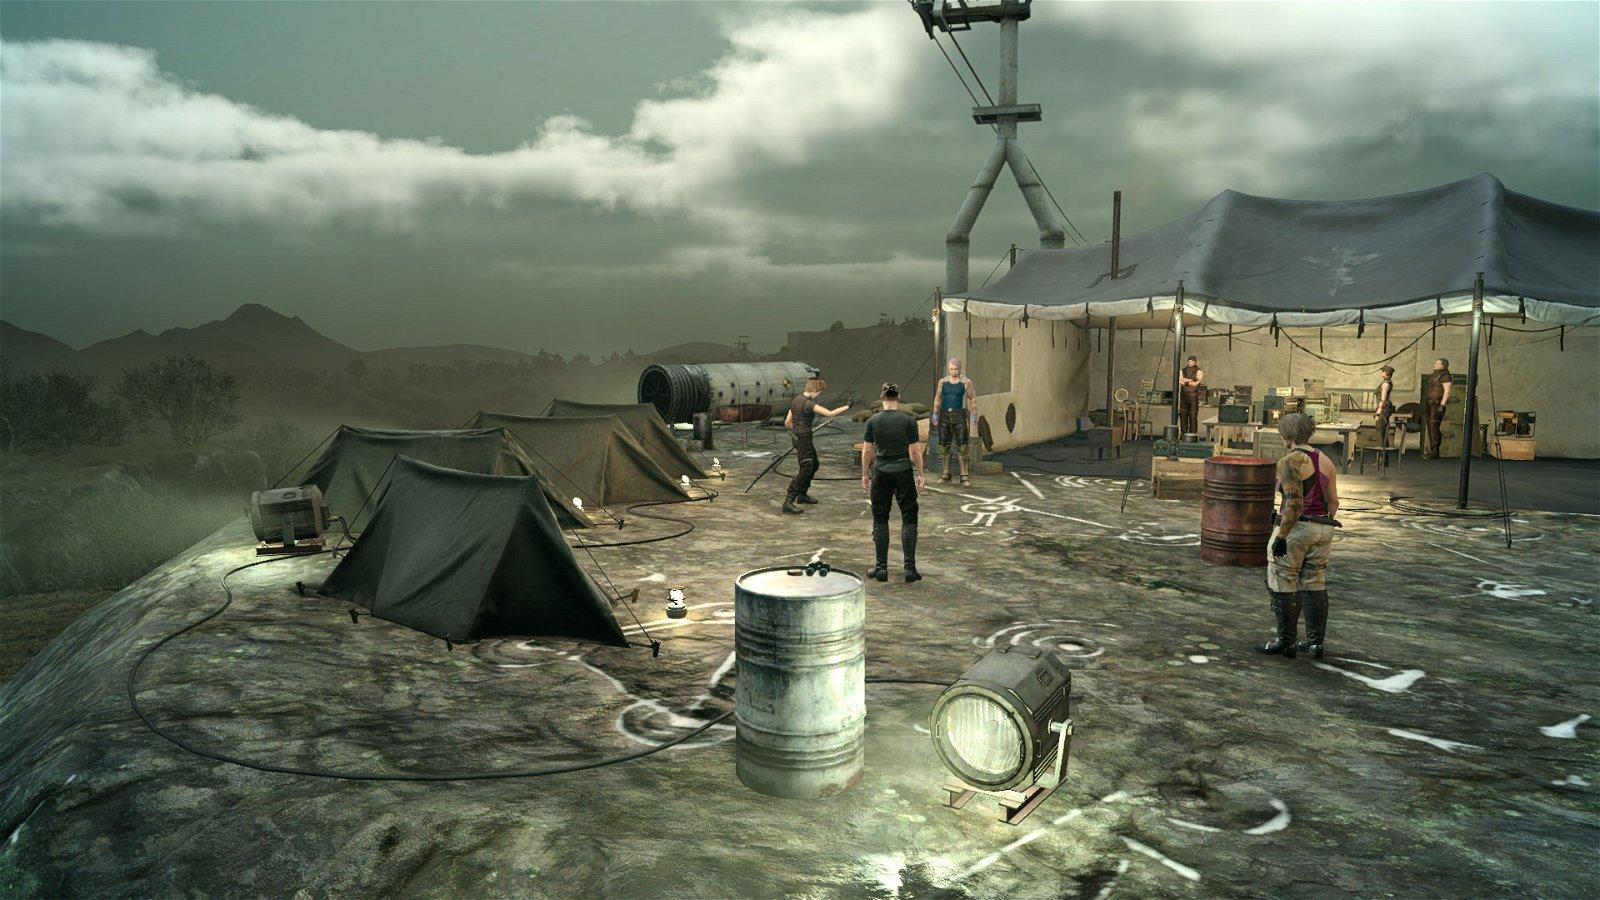 Final Fantasy Xv Multiplayer Beta Test Begins Next Week